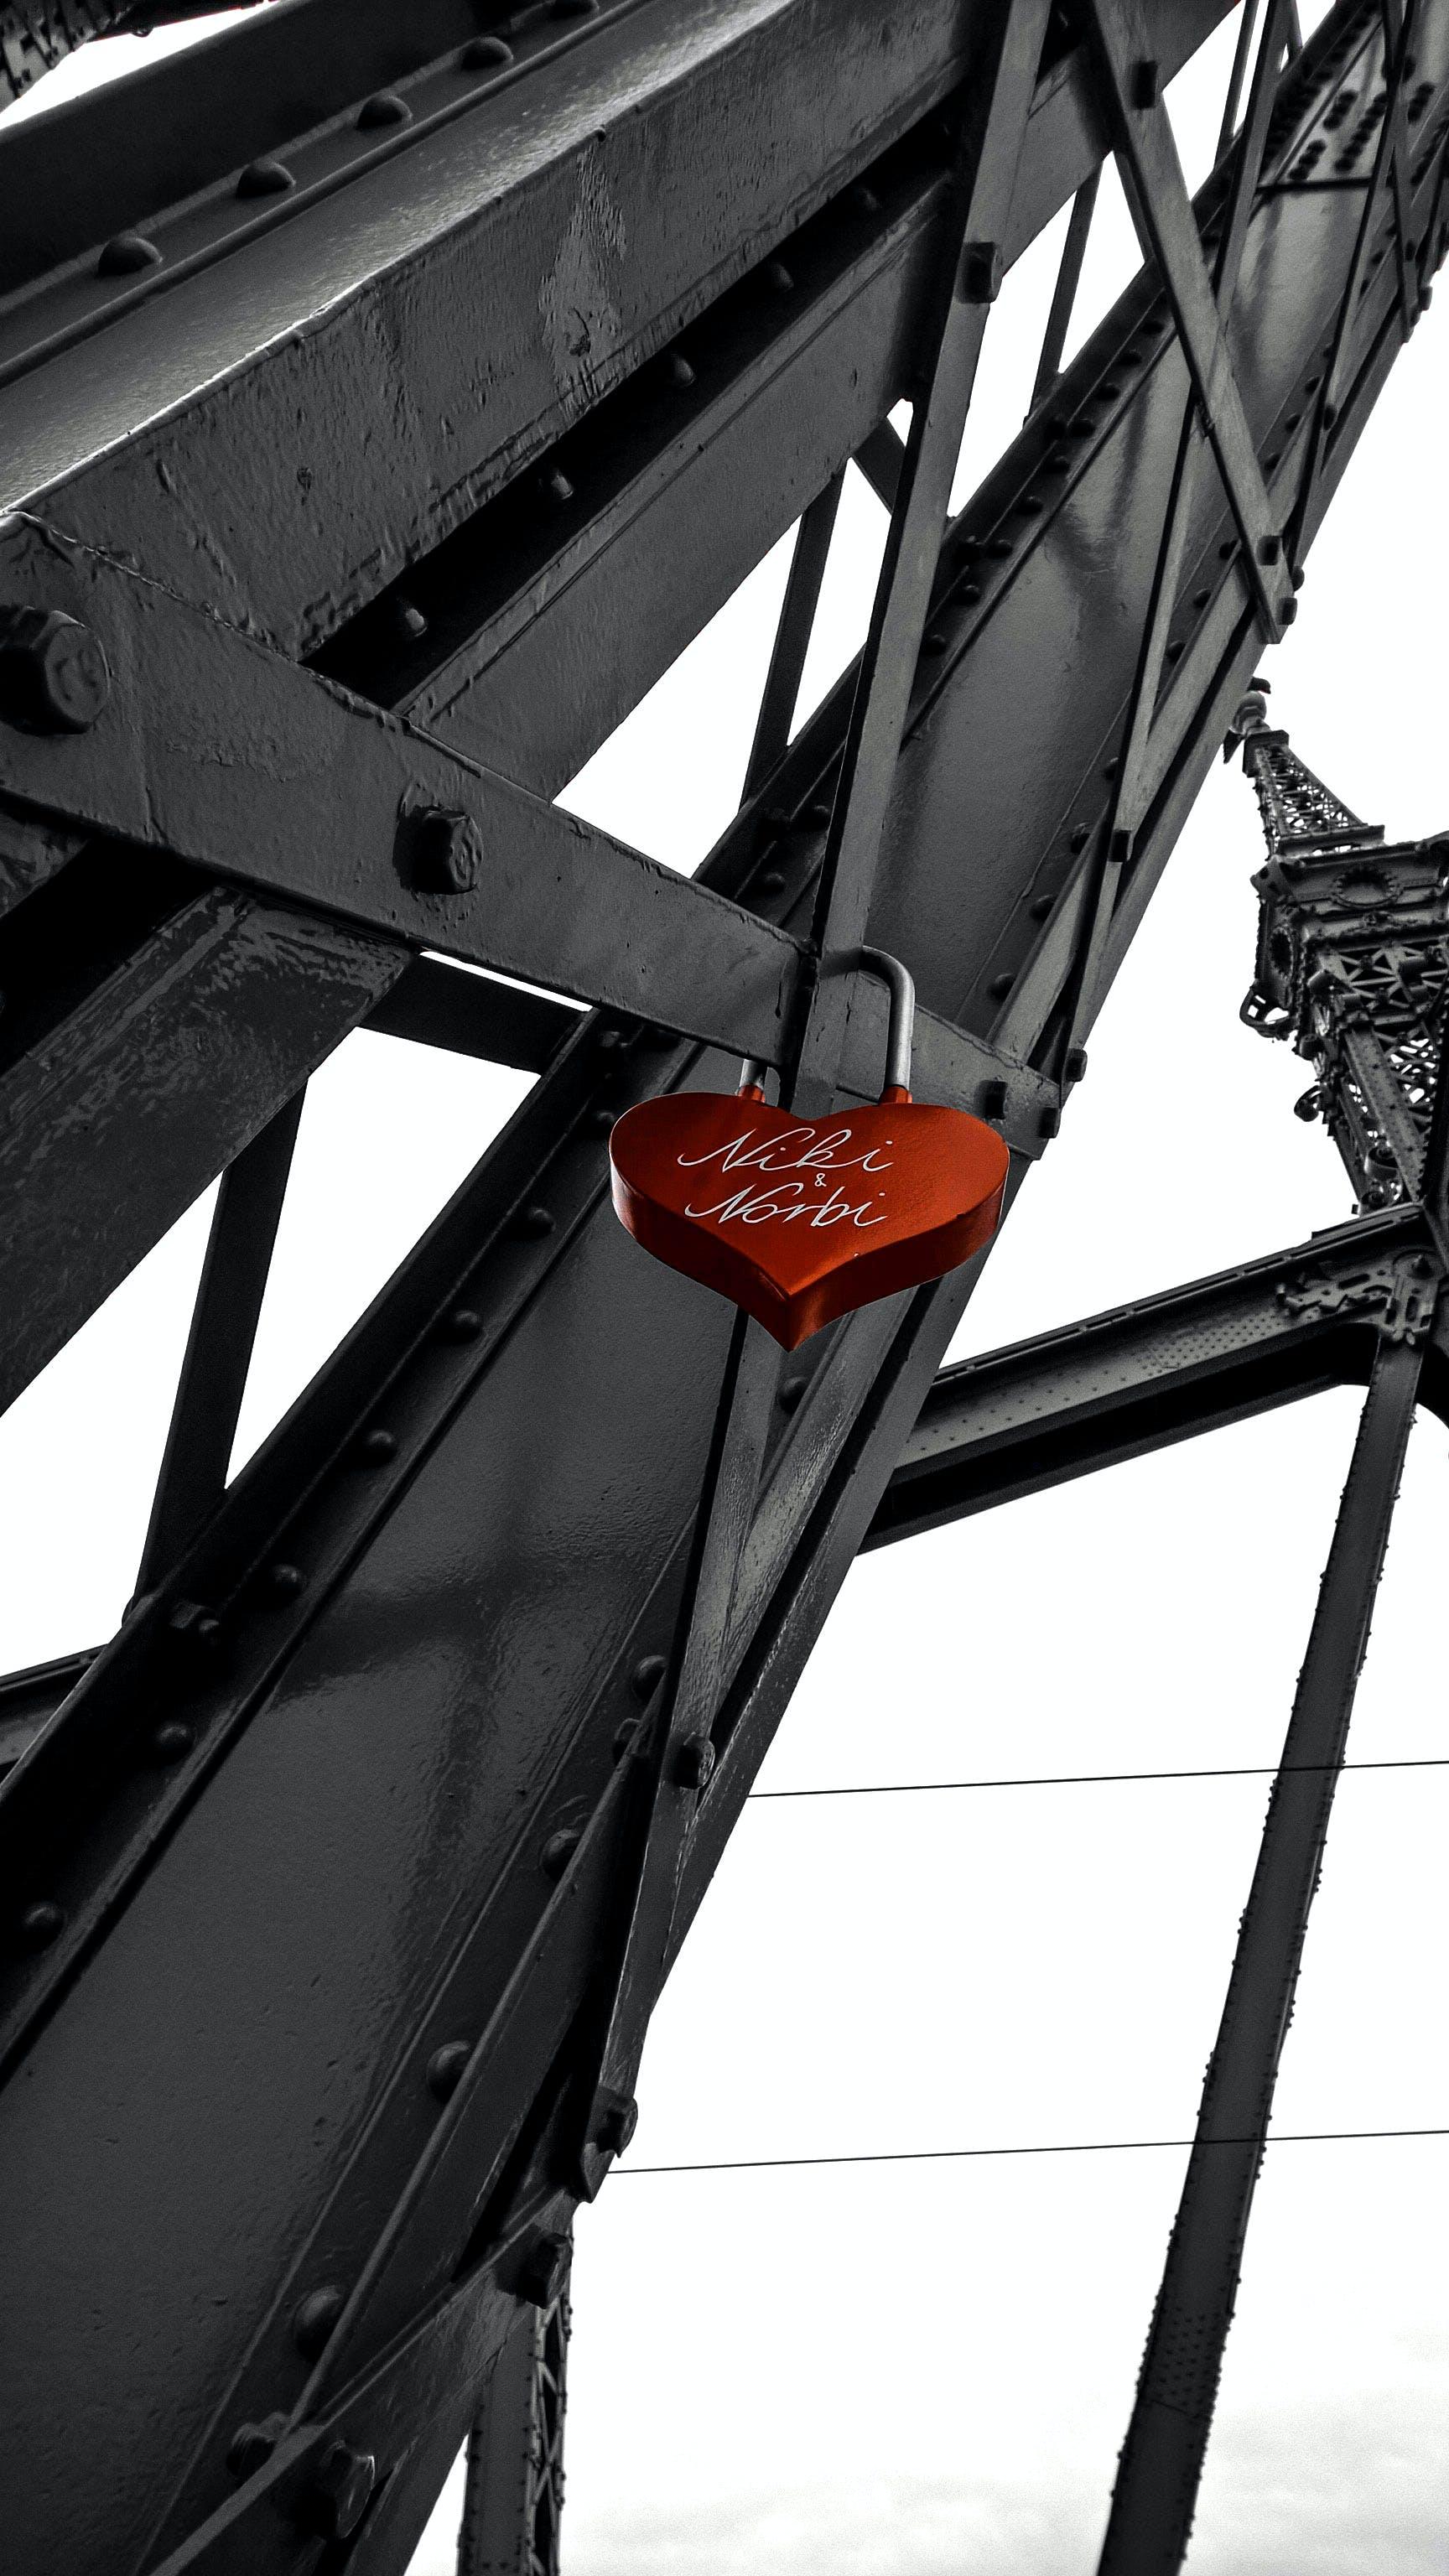 Free stock photo of bridge, river, hungary, Budapest